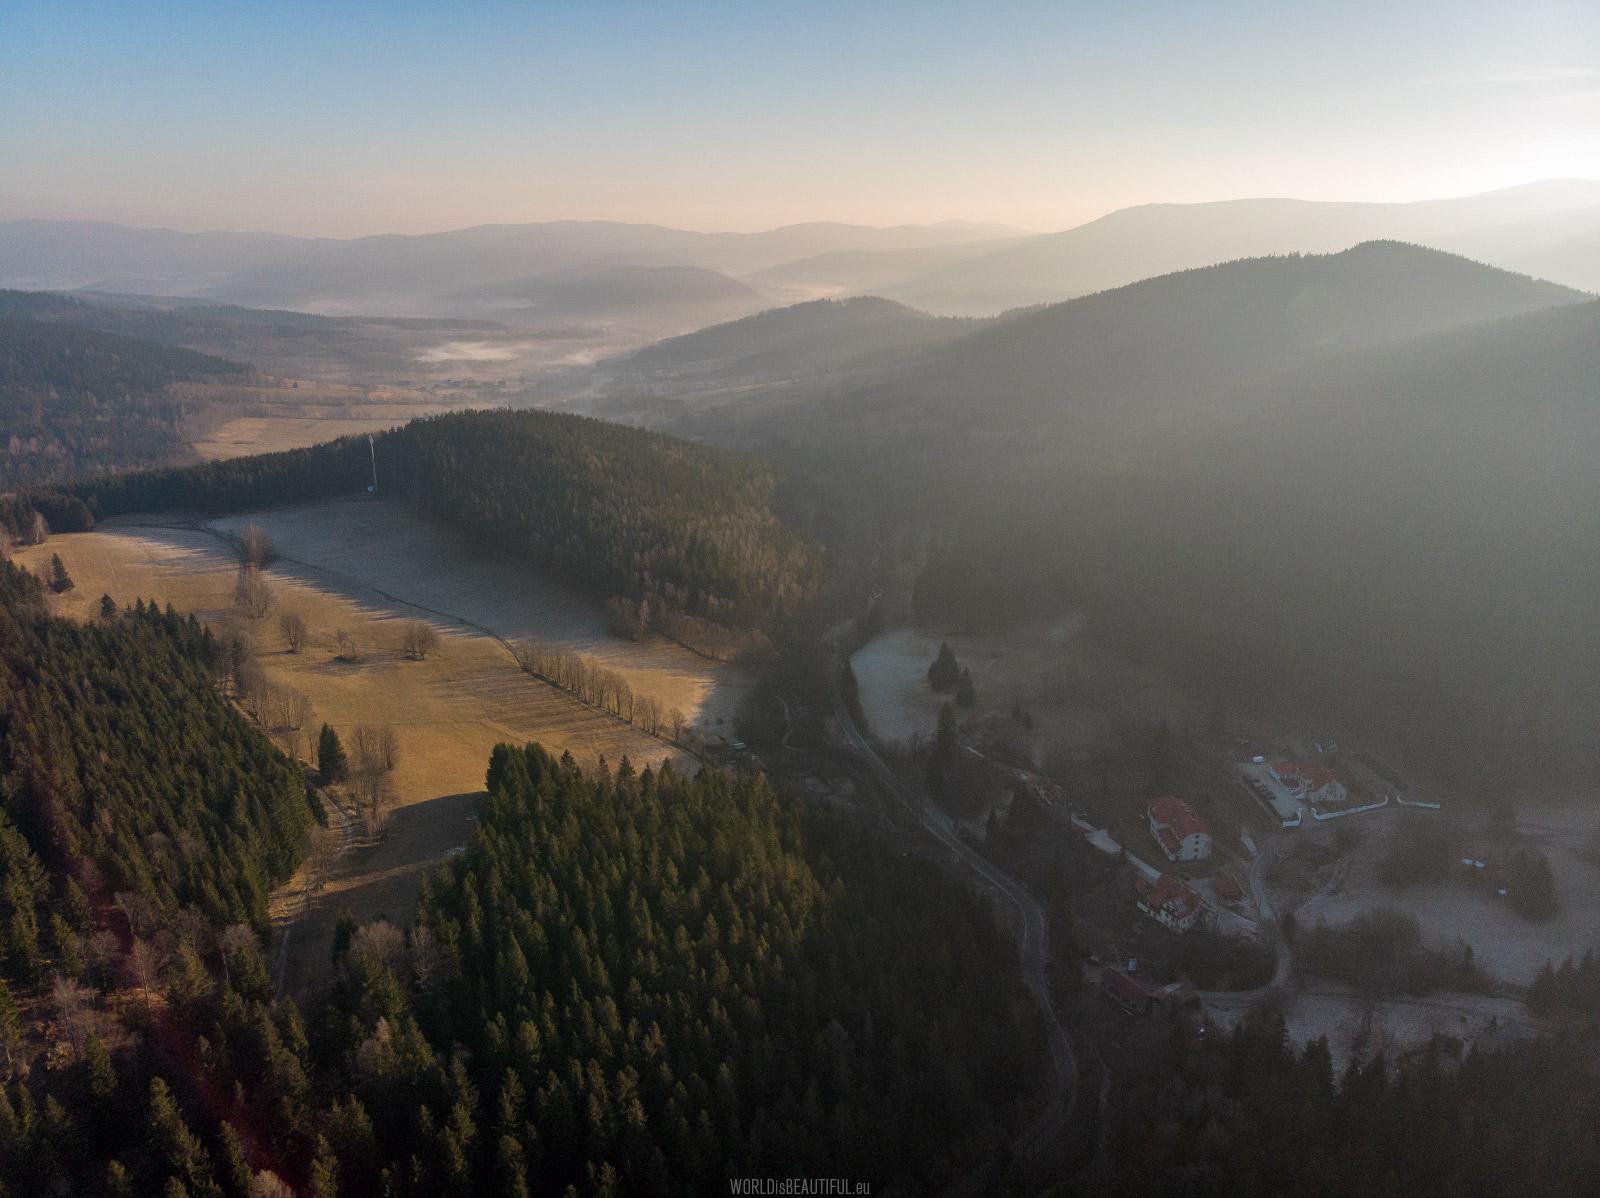 Góry Bialskie